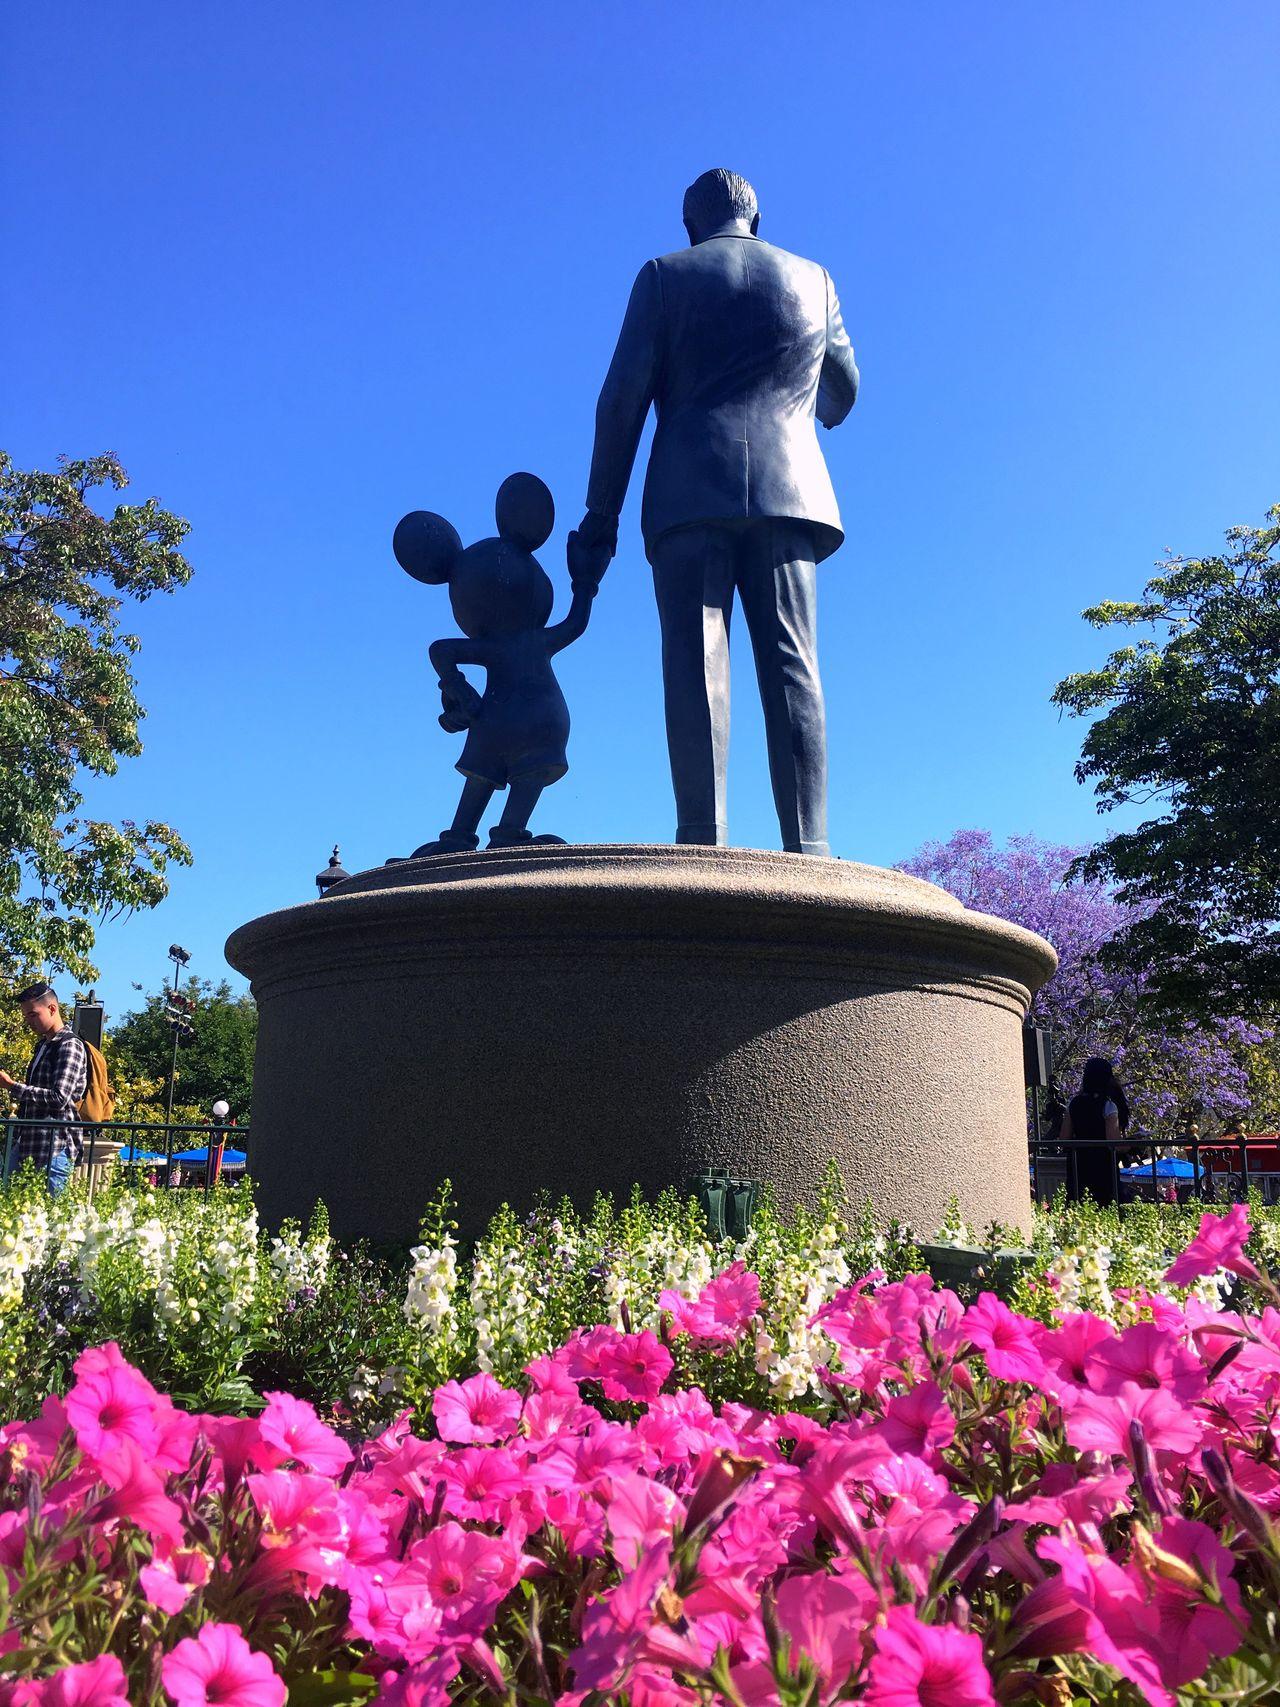 Hold my hand to tomorrow land Disney Disneyland California Mickey Mouse Flowers,Plants & Garden Blue Sky Happiestplaceonearth Waltdisney Mainstreet